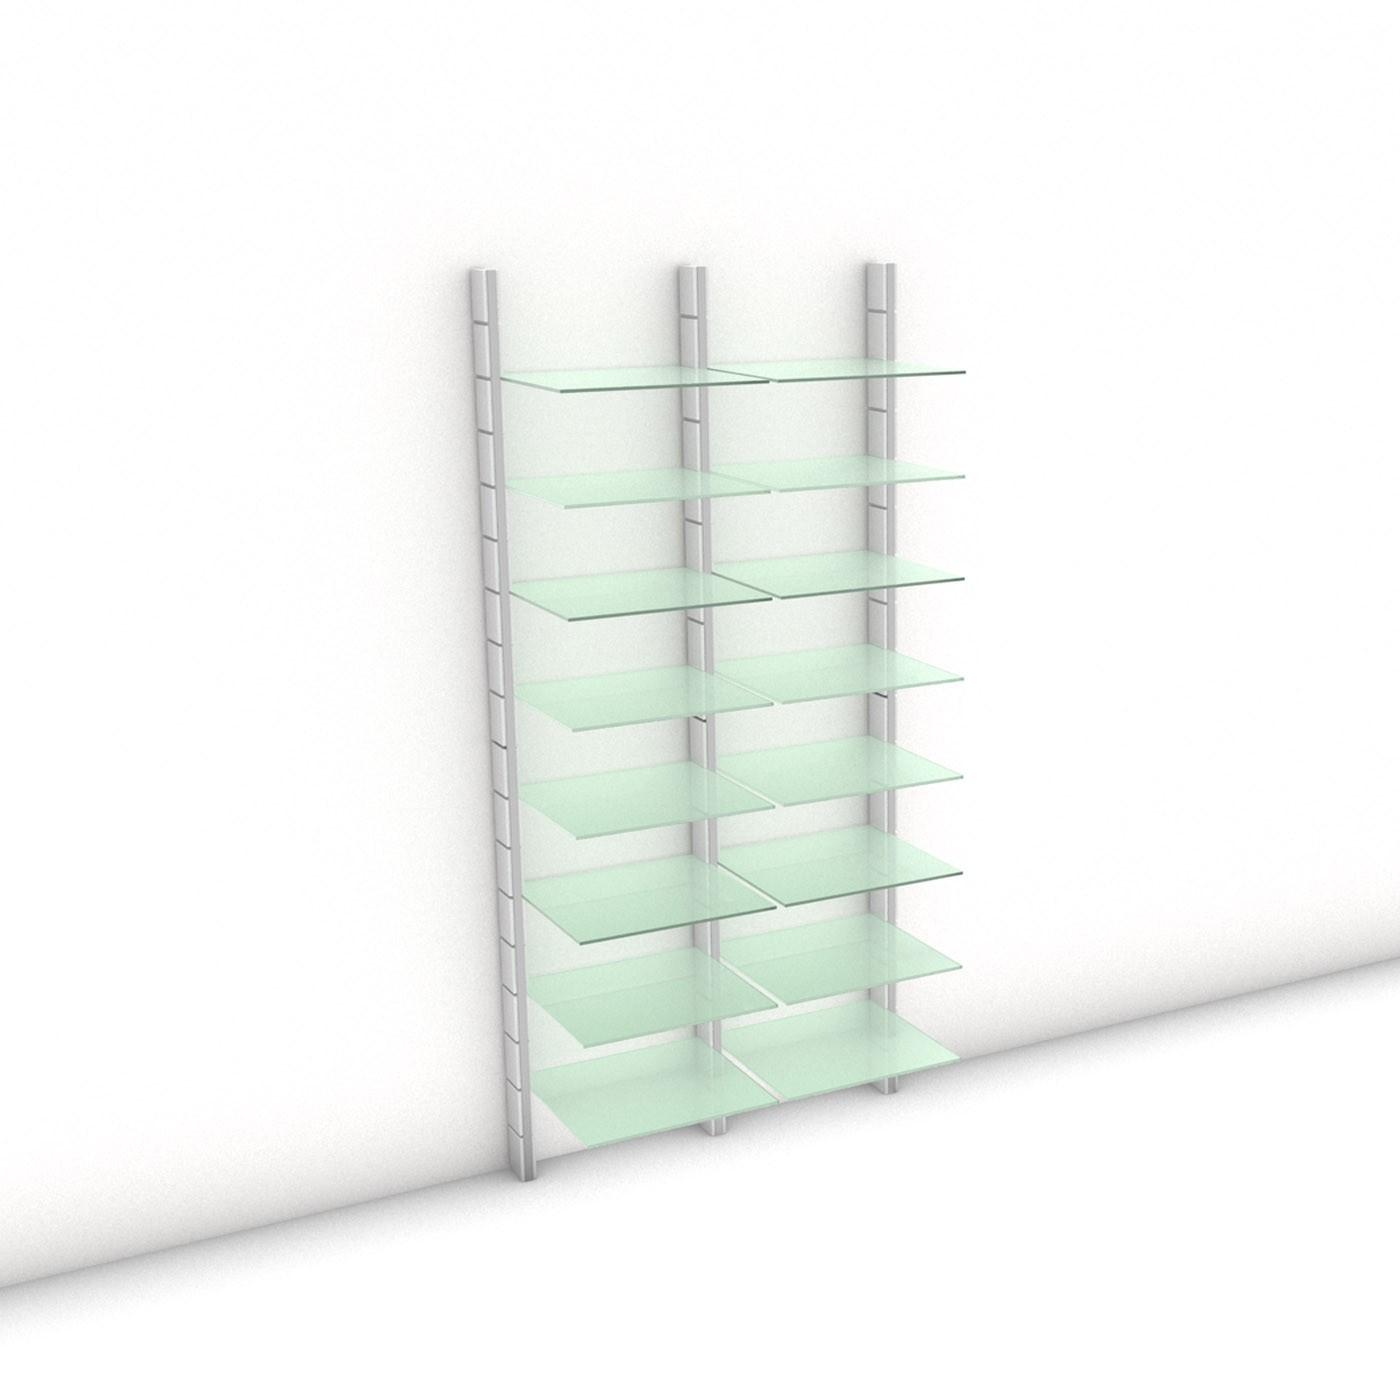 Begehbarer Kleiderschrank - Comfort (XL) 104 - Maß: 104 x 215,2 x 45 cm (B x H x T)